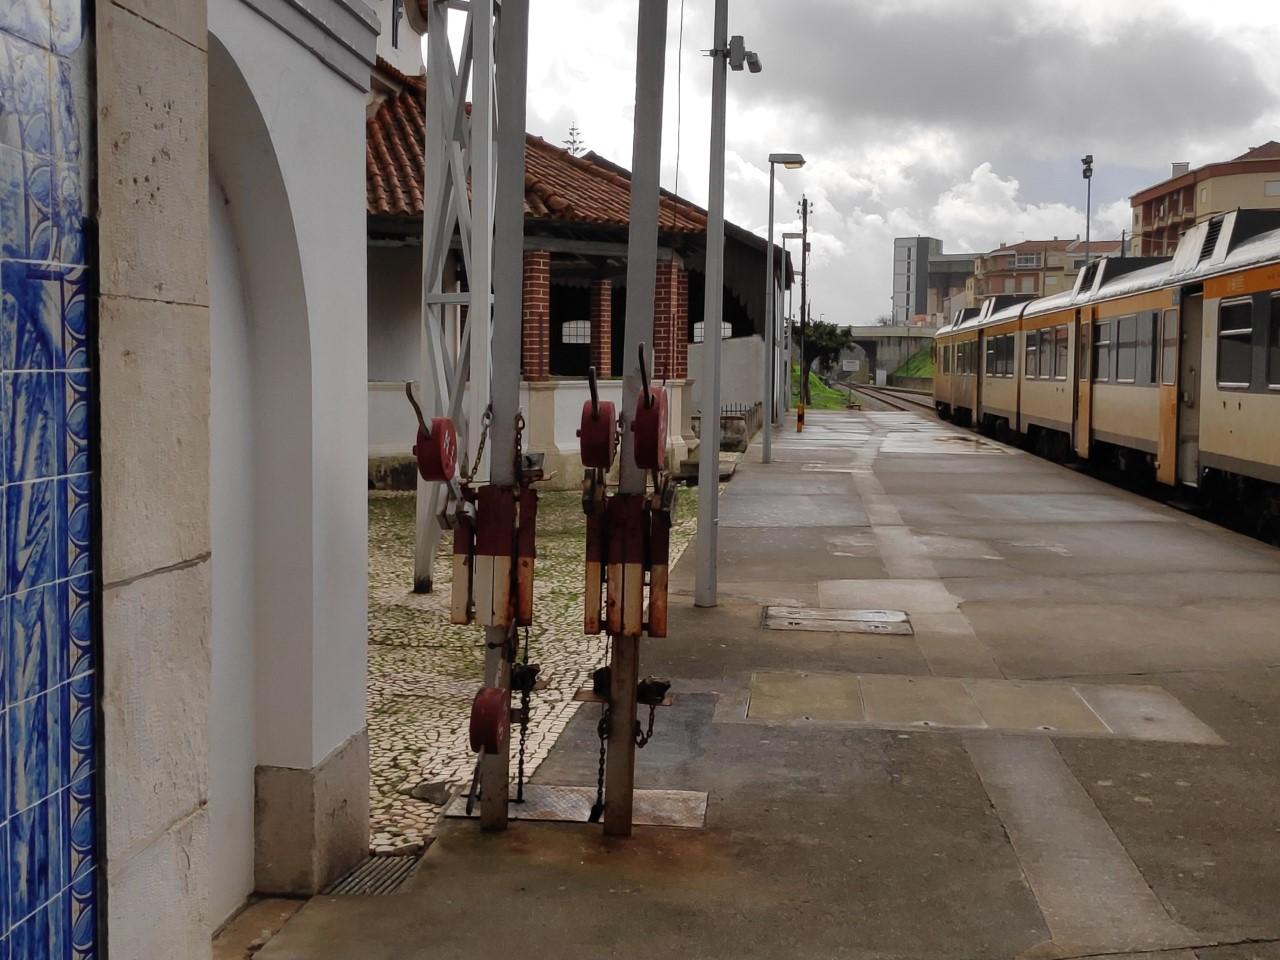 Visita sindical a Caldas da Rainha